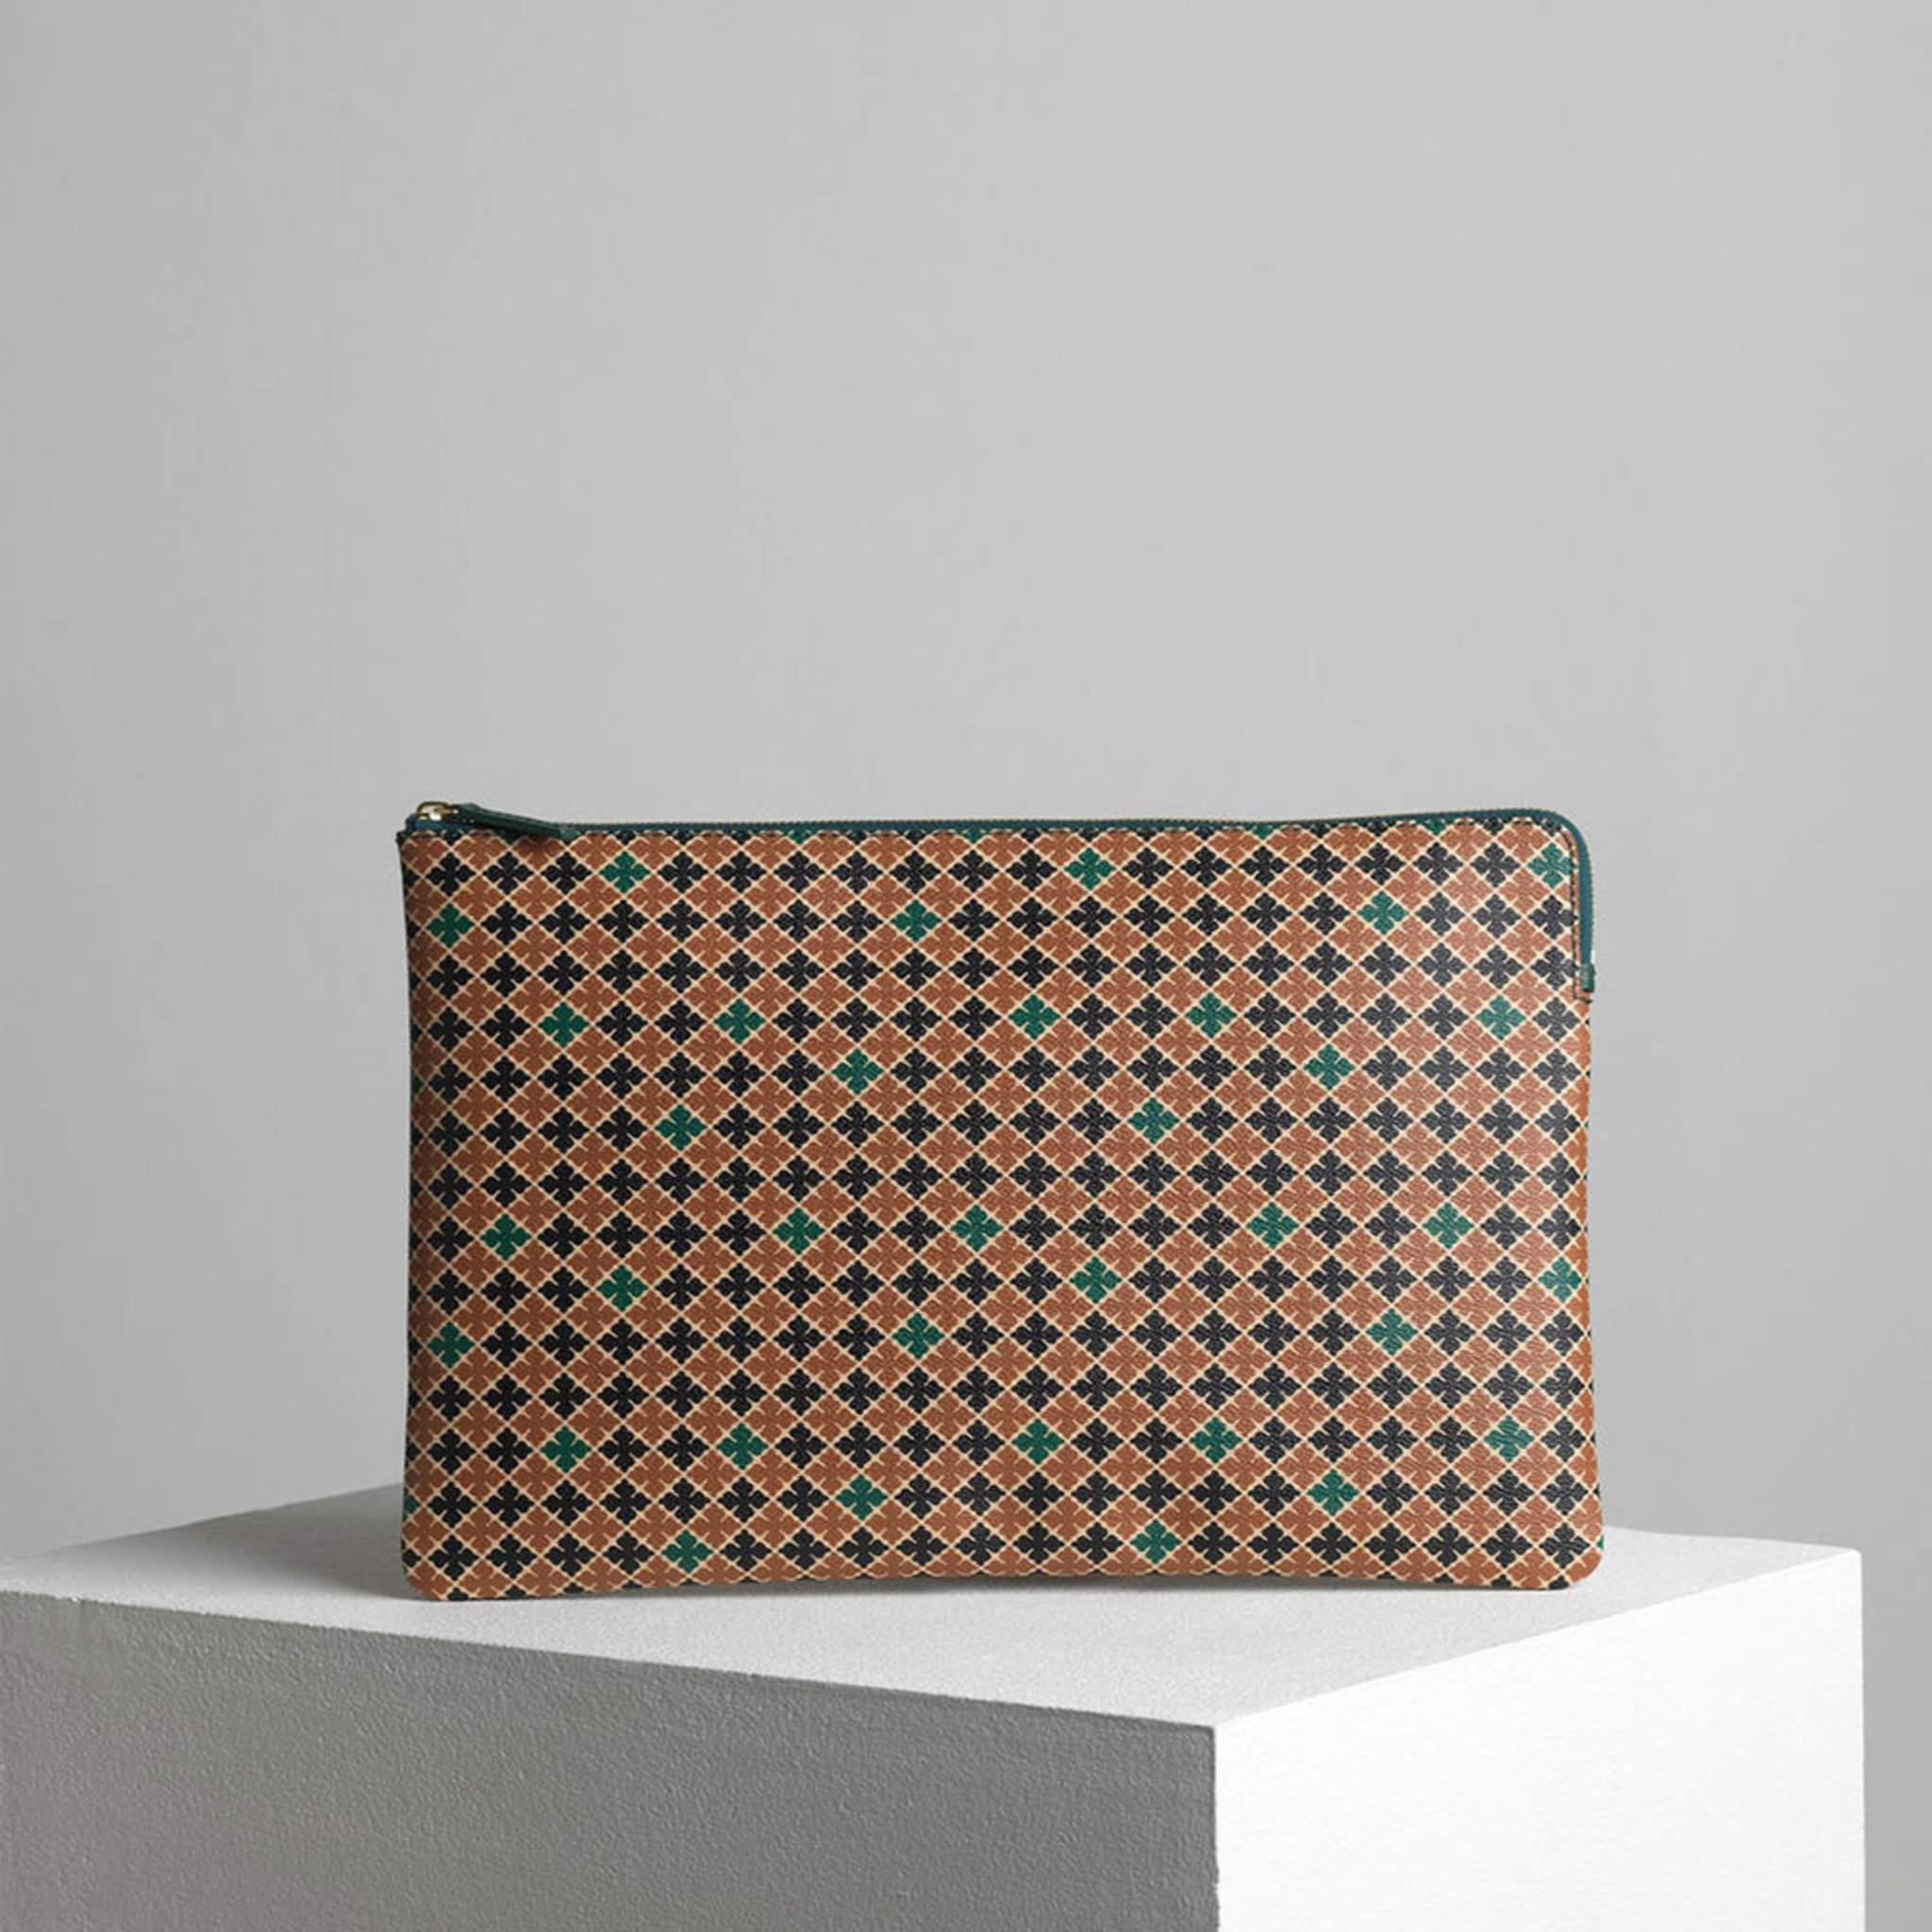 59d30e746 Ivy Laptop Bag, ljusgrön